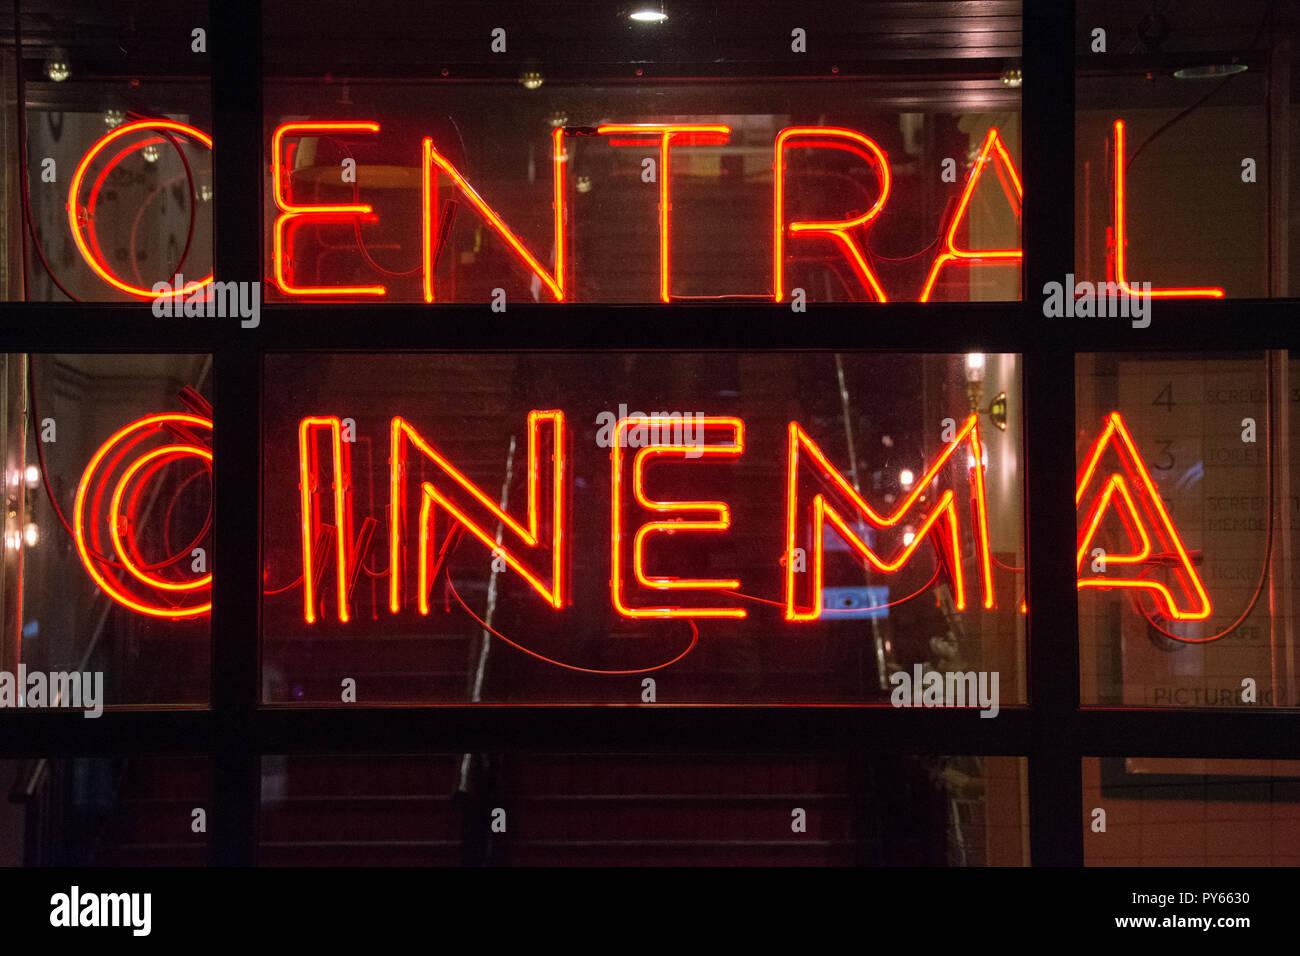 Neon lights outside Picturehouse Cental Cinema in Soho, London, UK - Stock Image